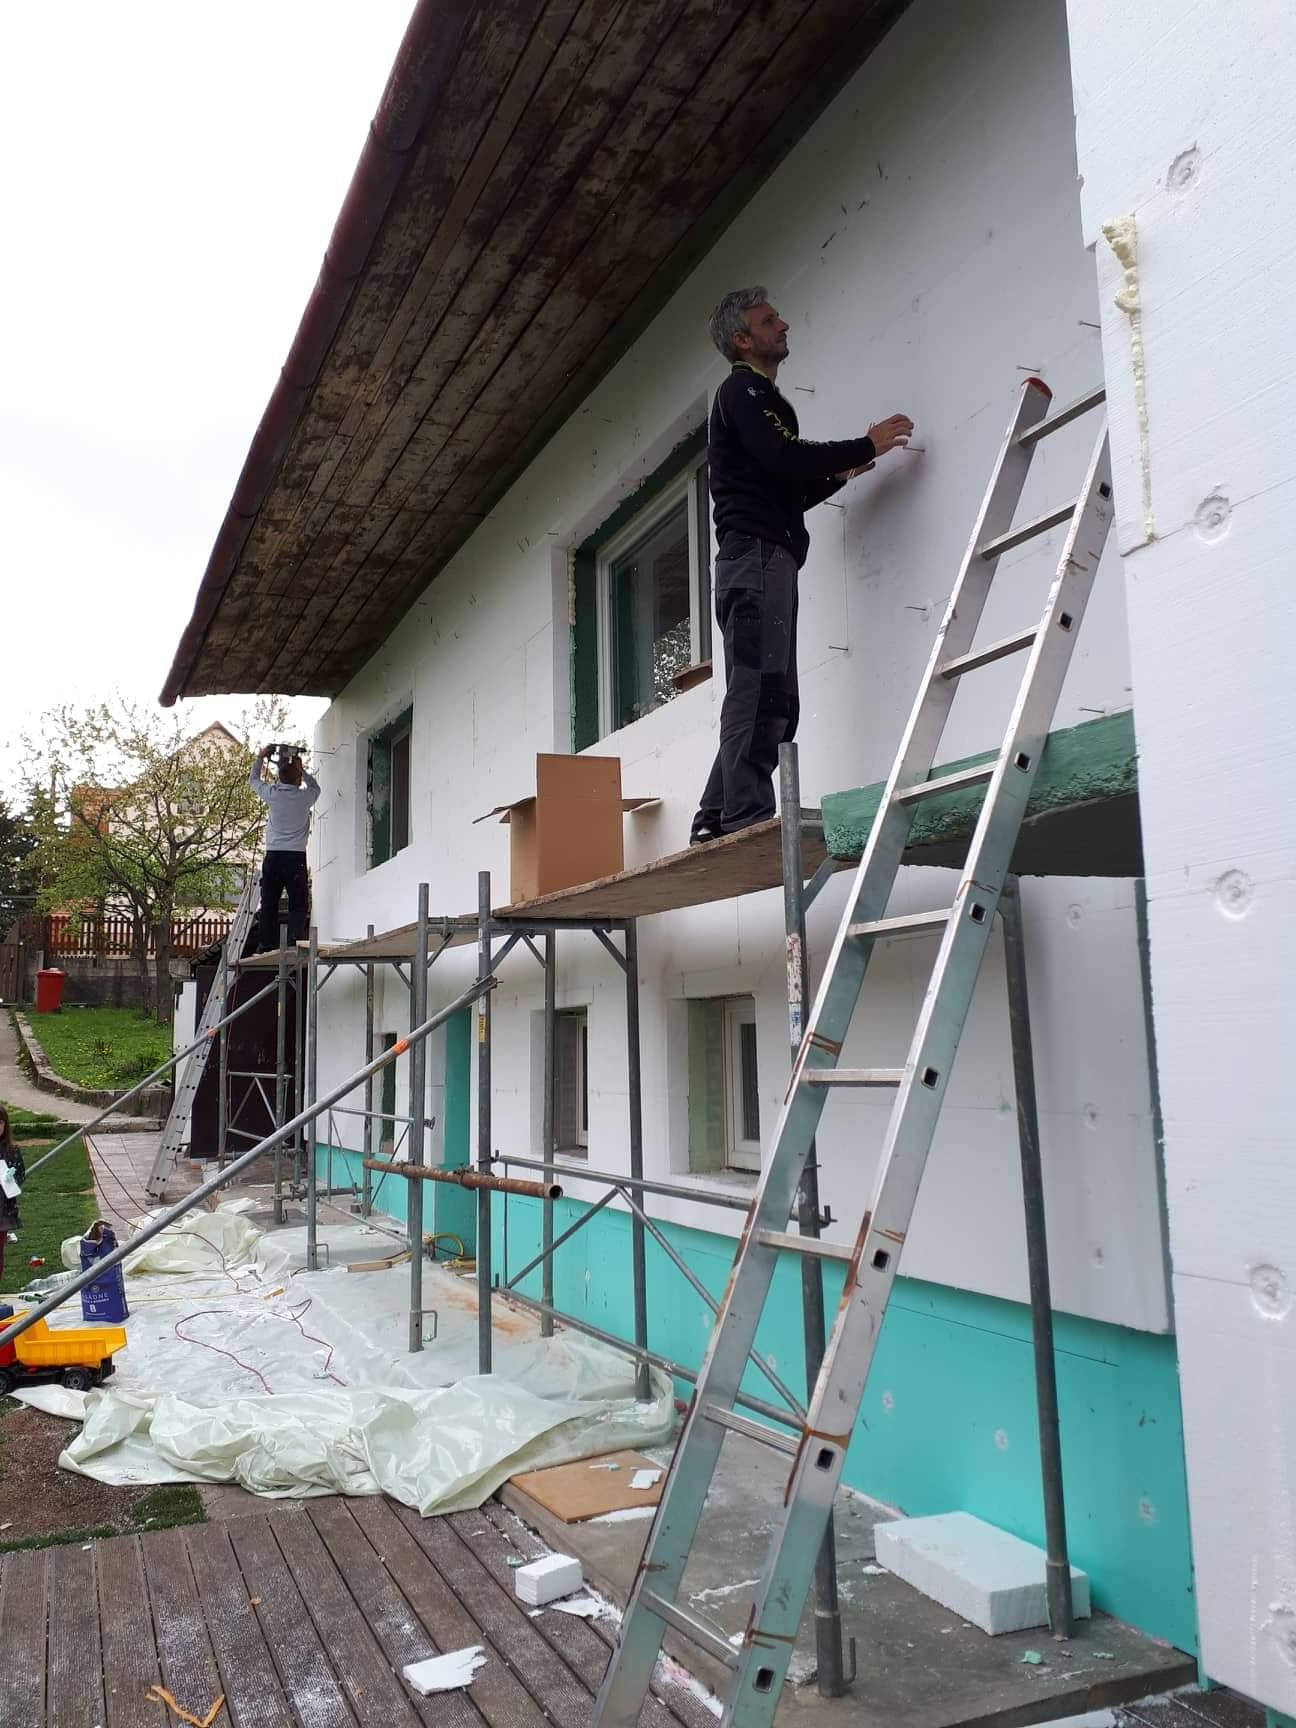 Naša rekonštrukcia - na jar 2019 sme zateplili domček